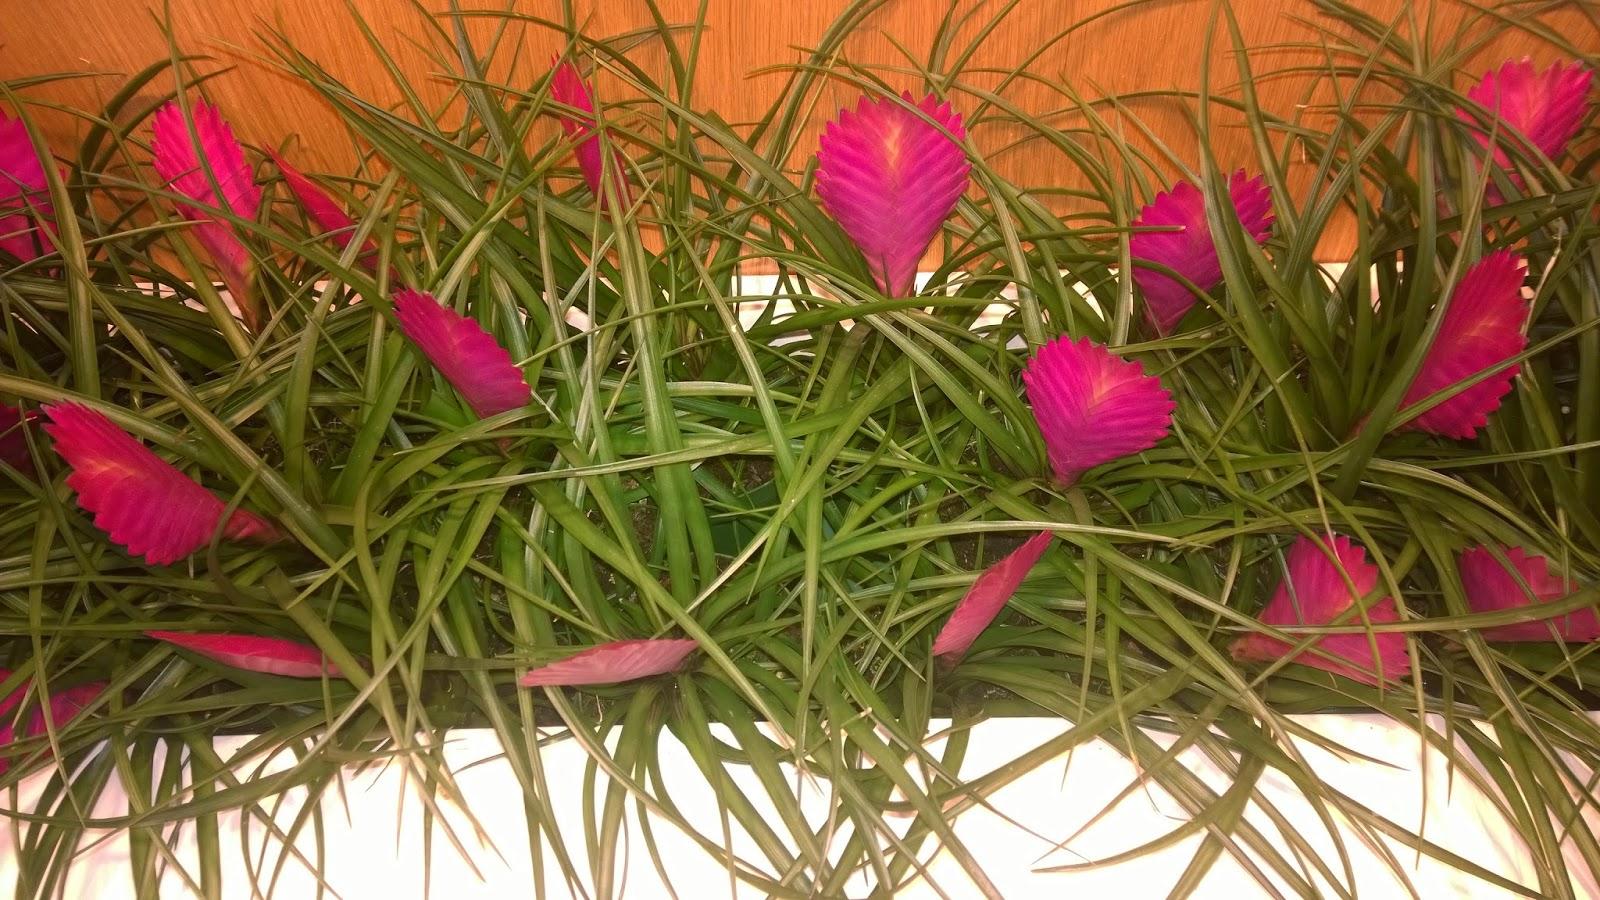 Tillandsia cyanea - Pink Quill Bromeliad